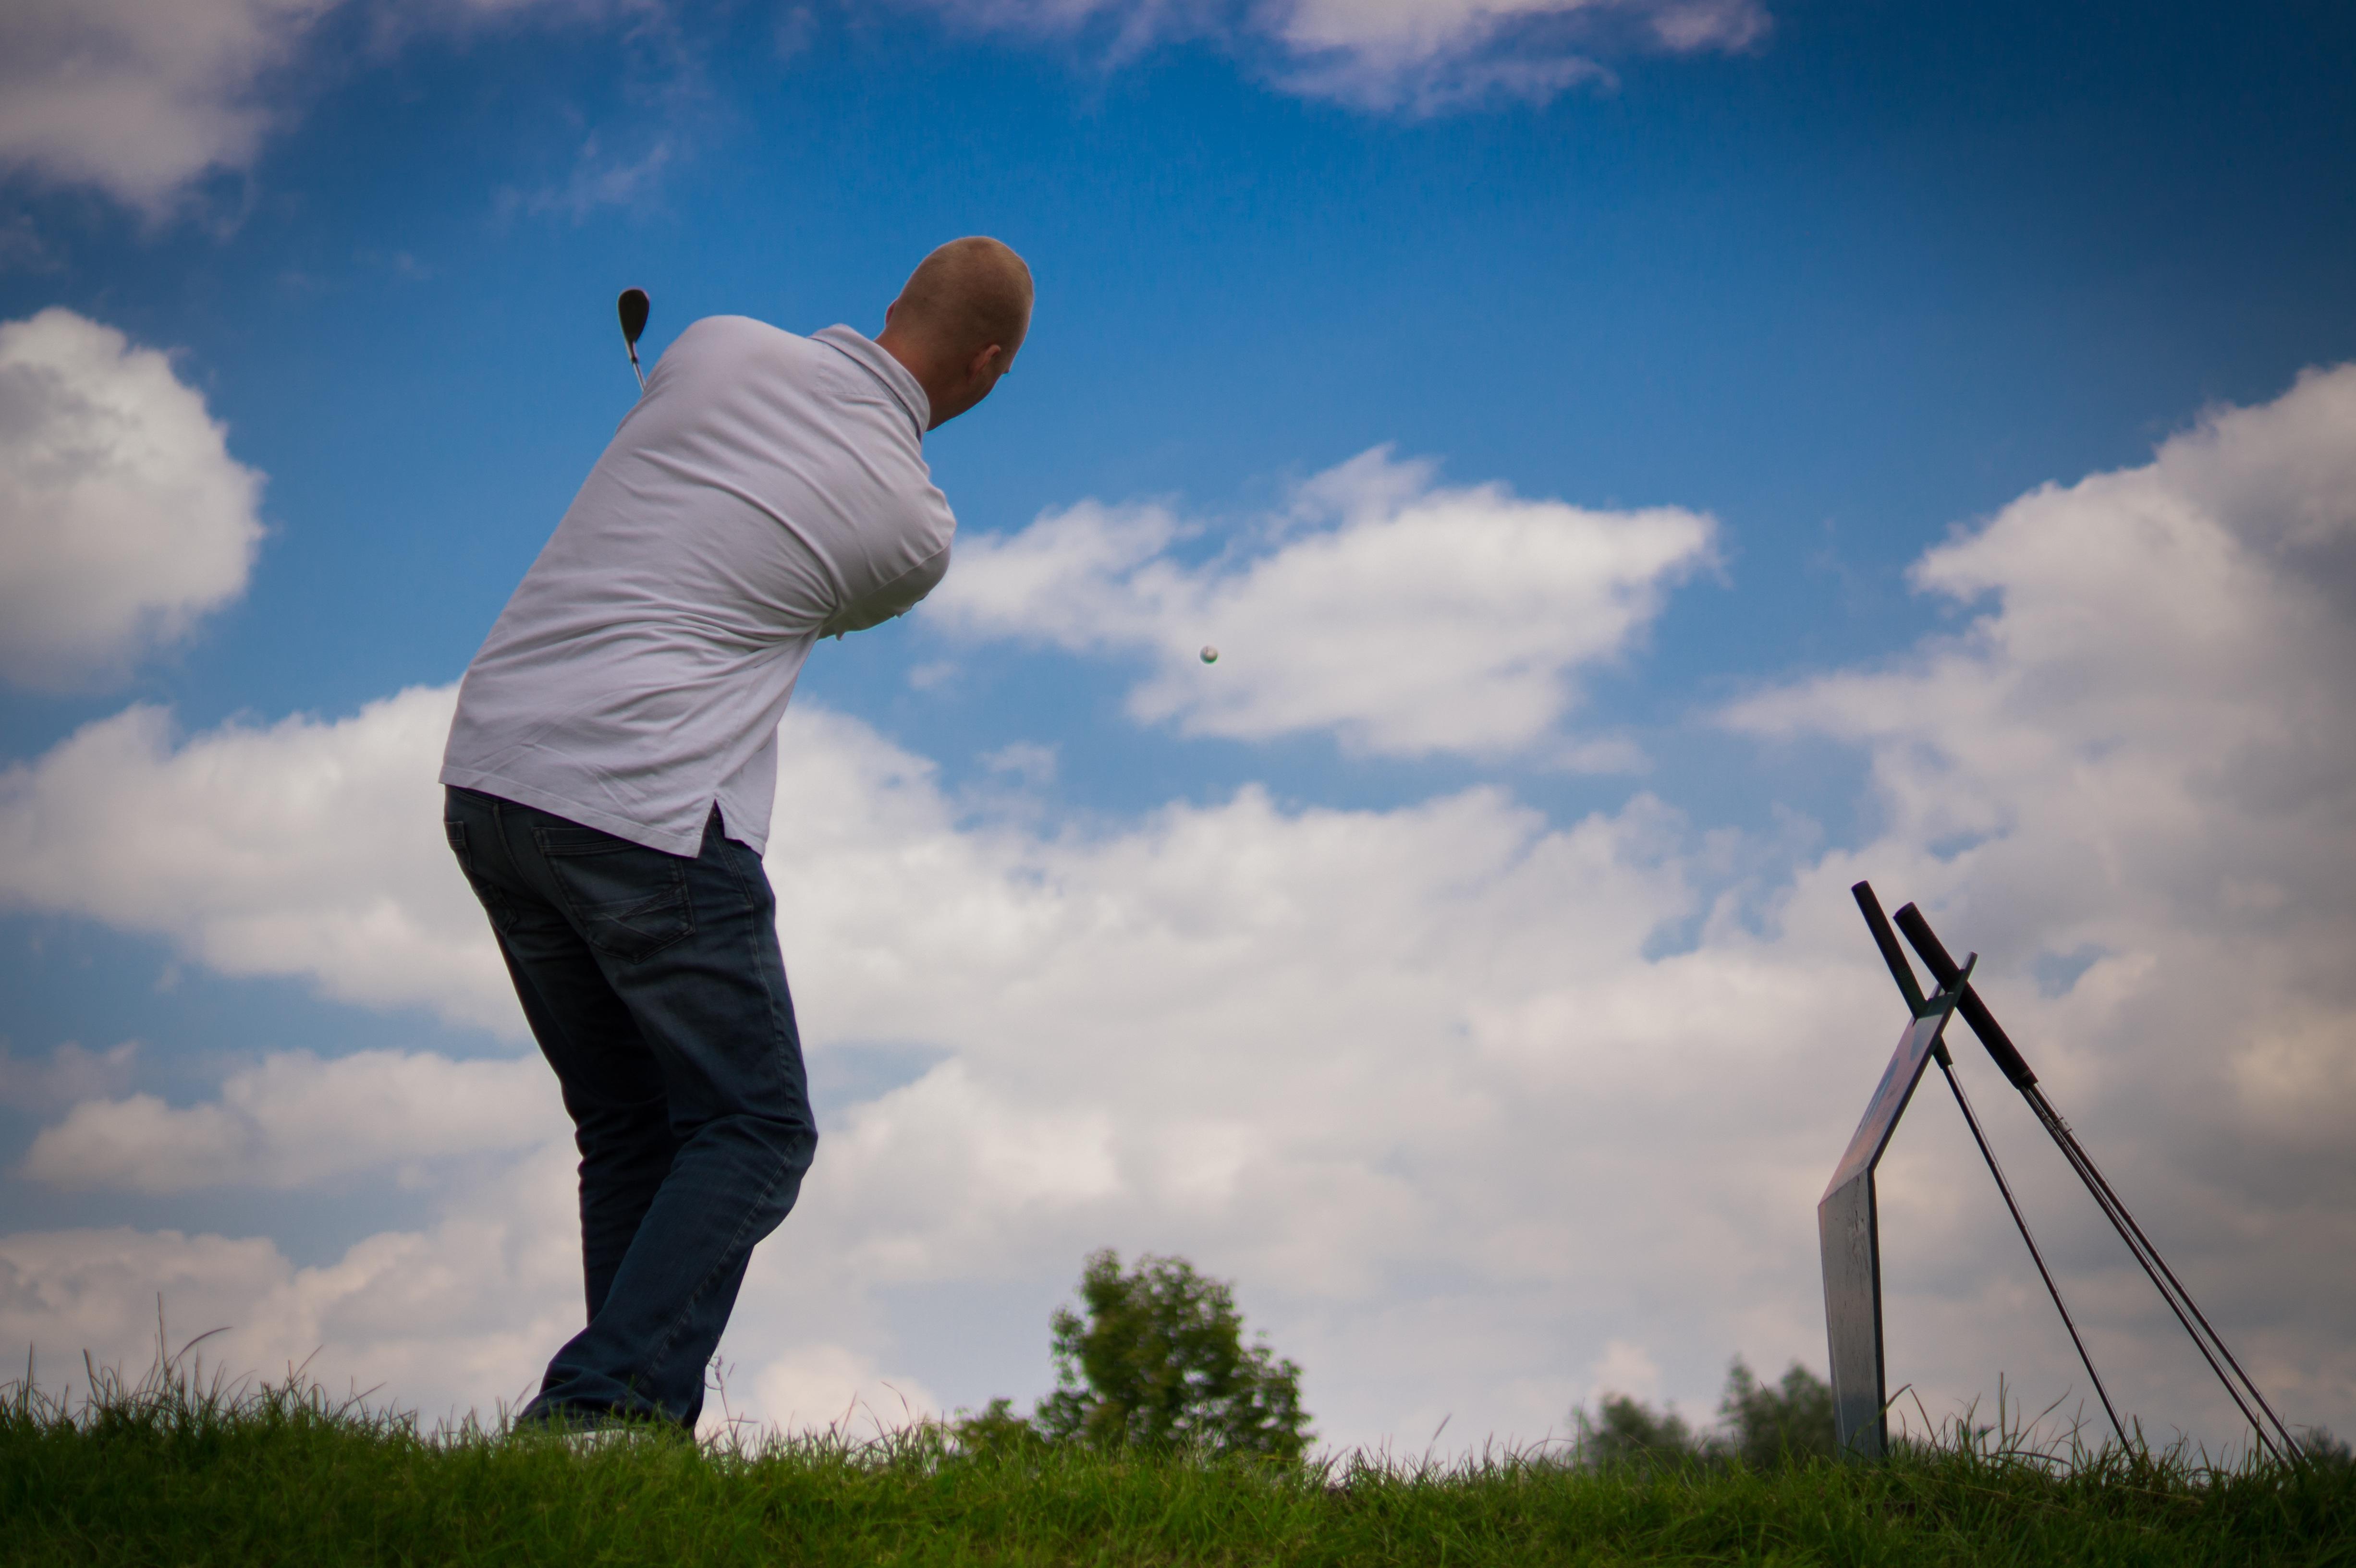 Playing Golf, Activity, Golf, Golfer, Human, HQ Photo